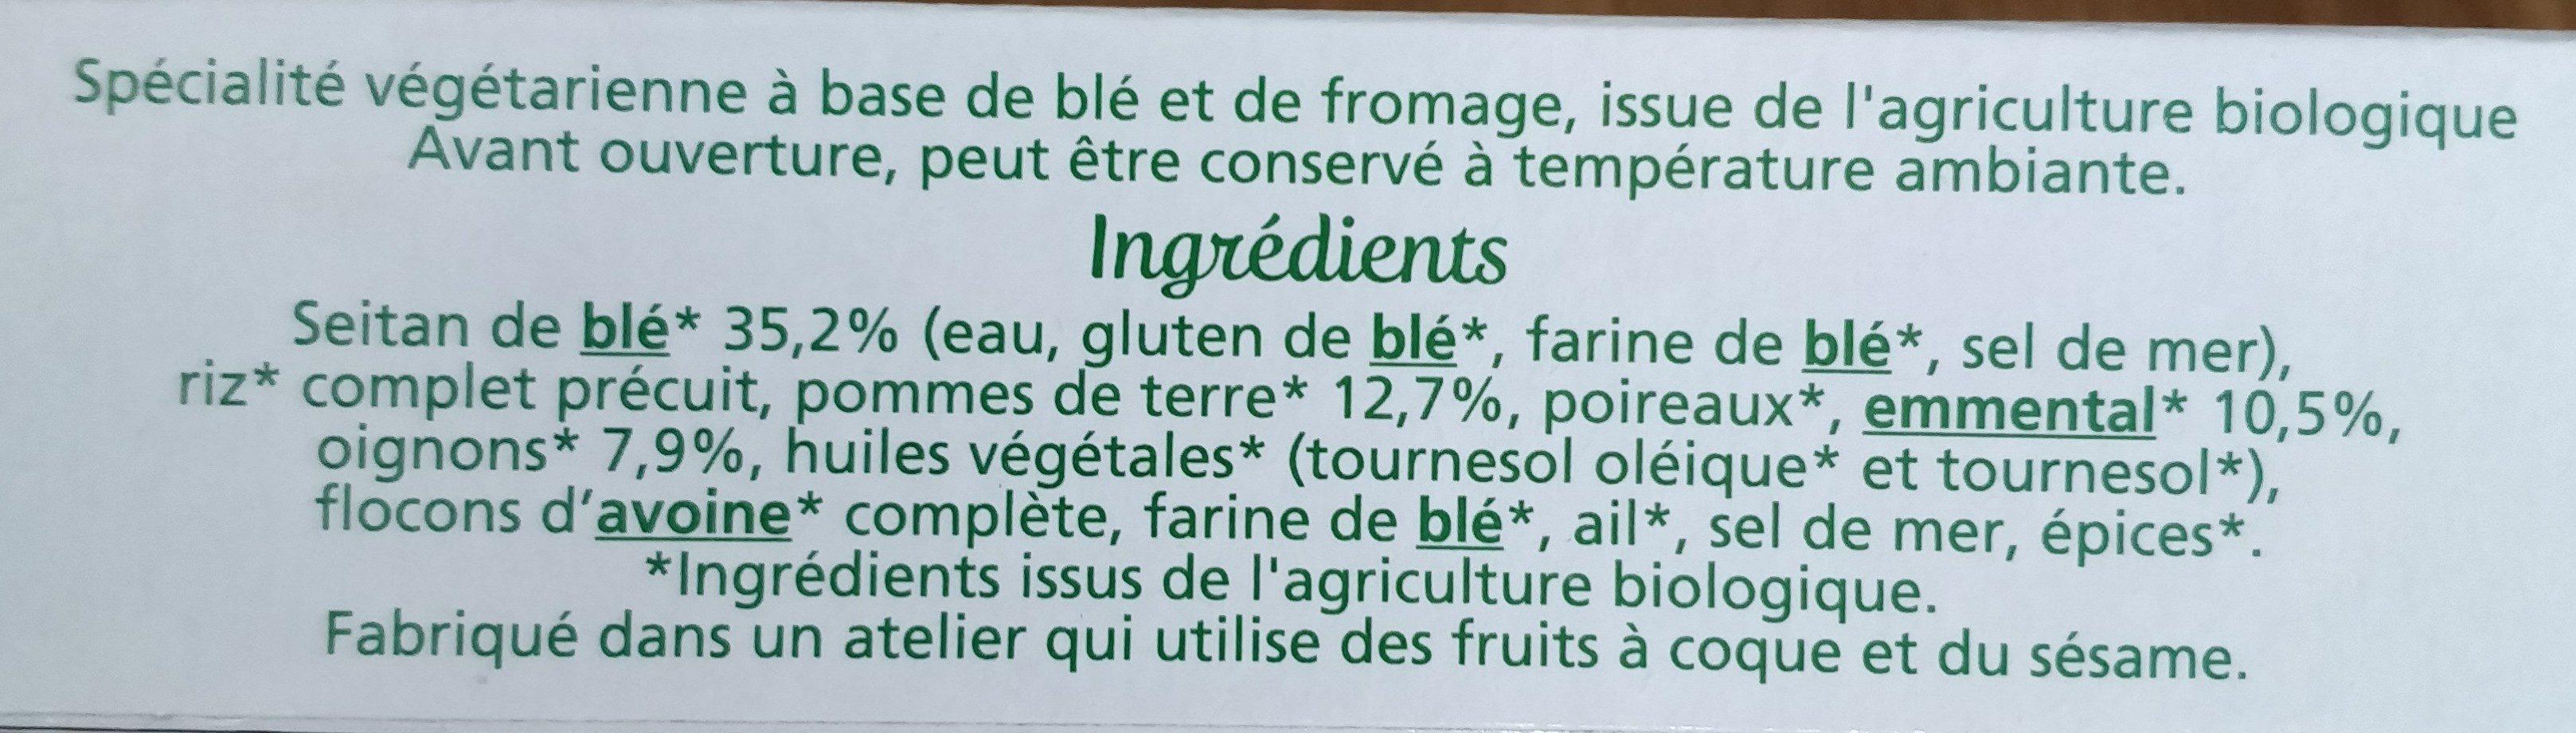 Tendres carrés de blé - Ingrediënten